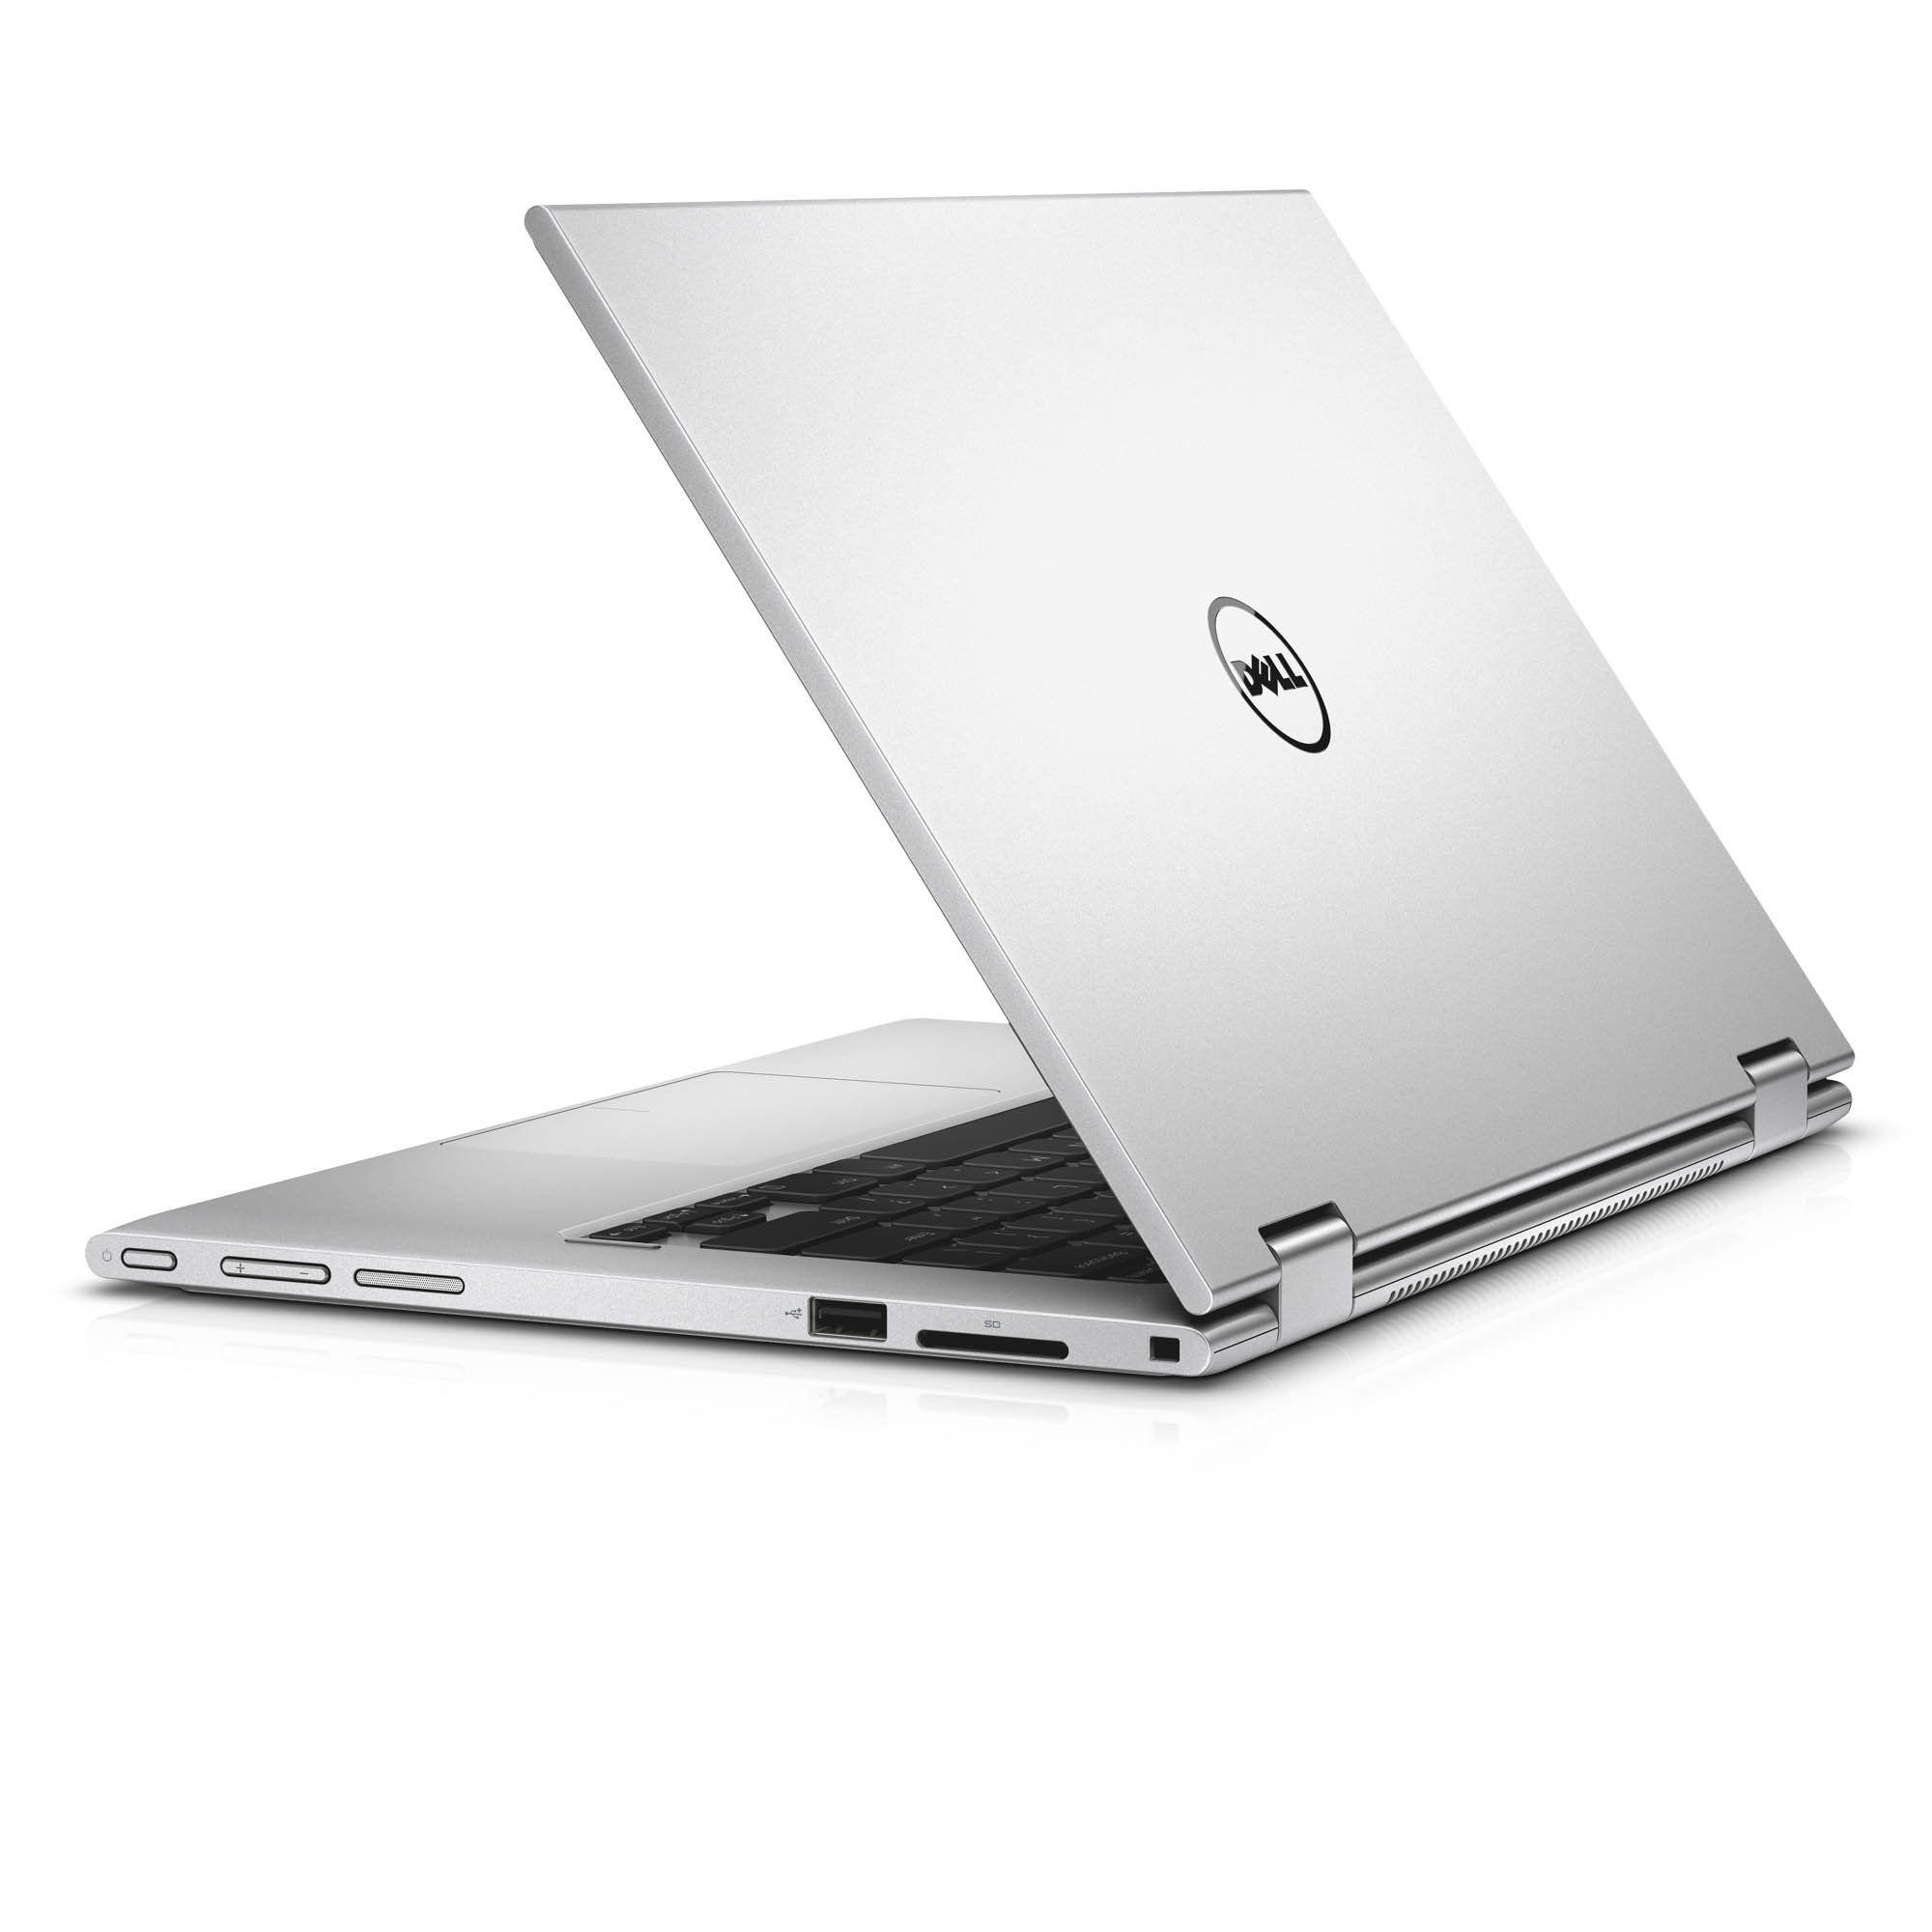 Amazon Com Dell Inspiron I3147 3750slv 11 6 Inch 2 In 1 Convertible Touchscreen Laptop Computers Accessories 379 9 Laptop Dell Inspiron Dell Inspiron 15